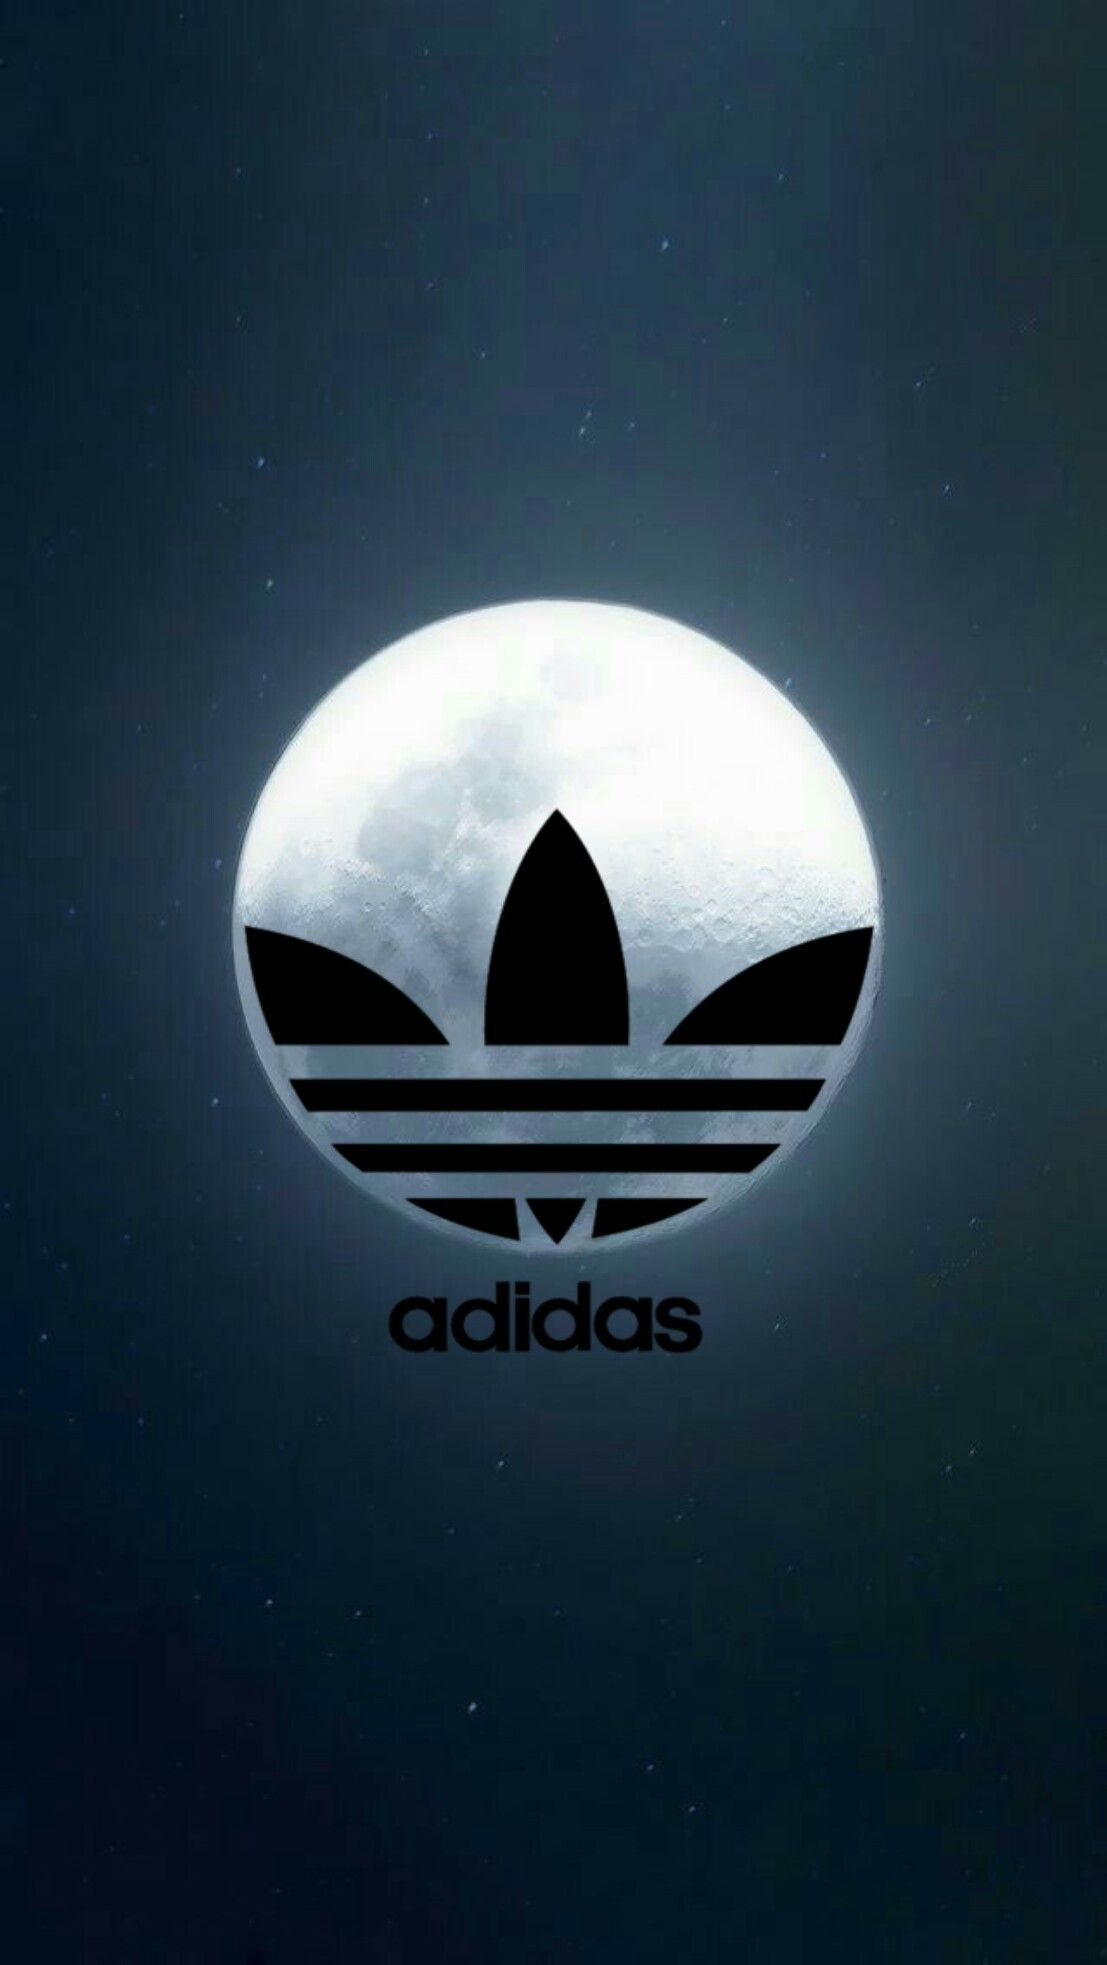 1107x1965 Adidas Black Wallpaper Android Iphone Adidas Iphone Wallpaper Adidas Wallpapers Adidas Wallpaper Iphone